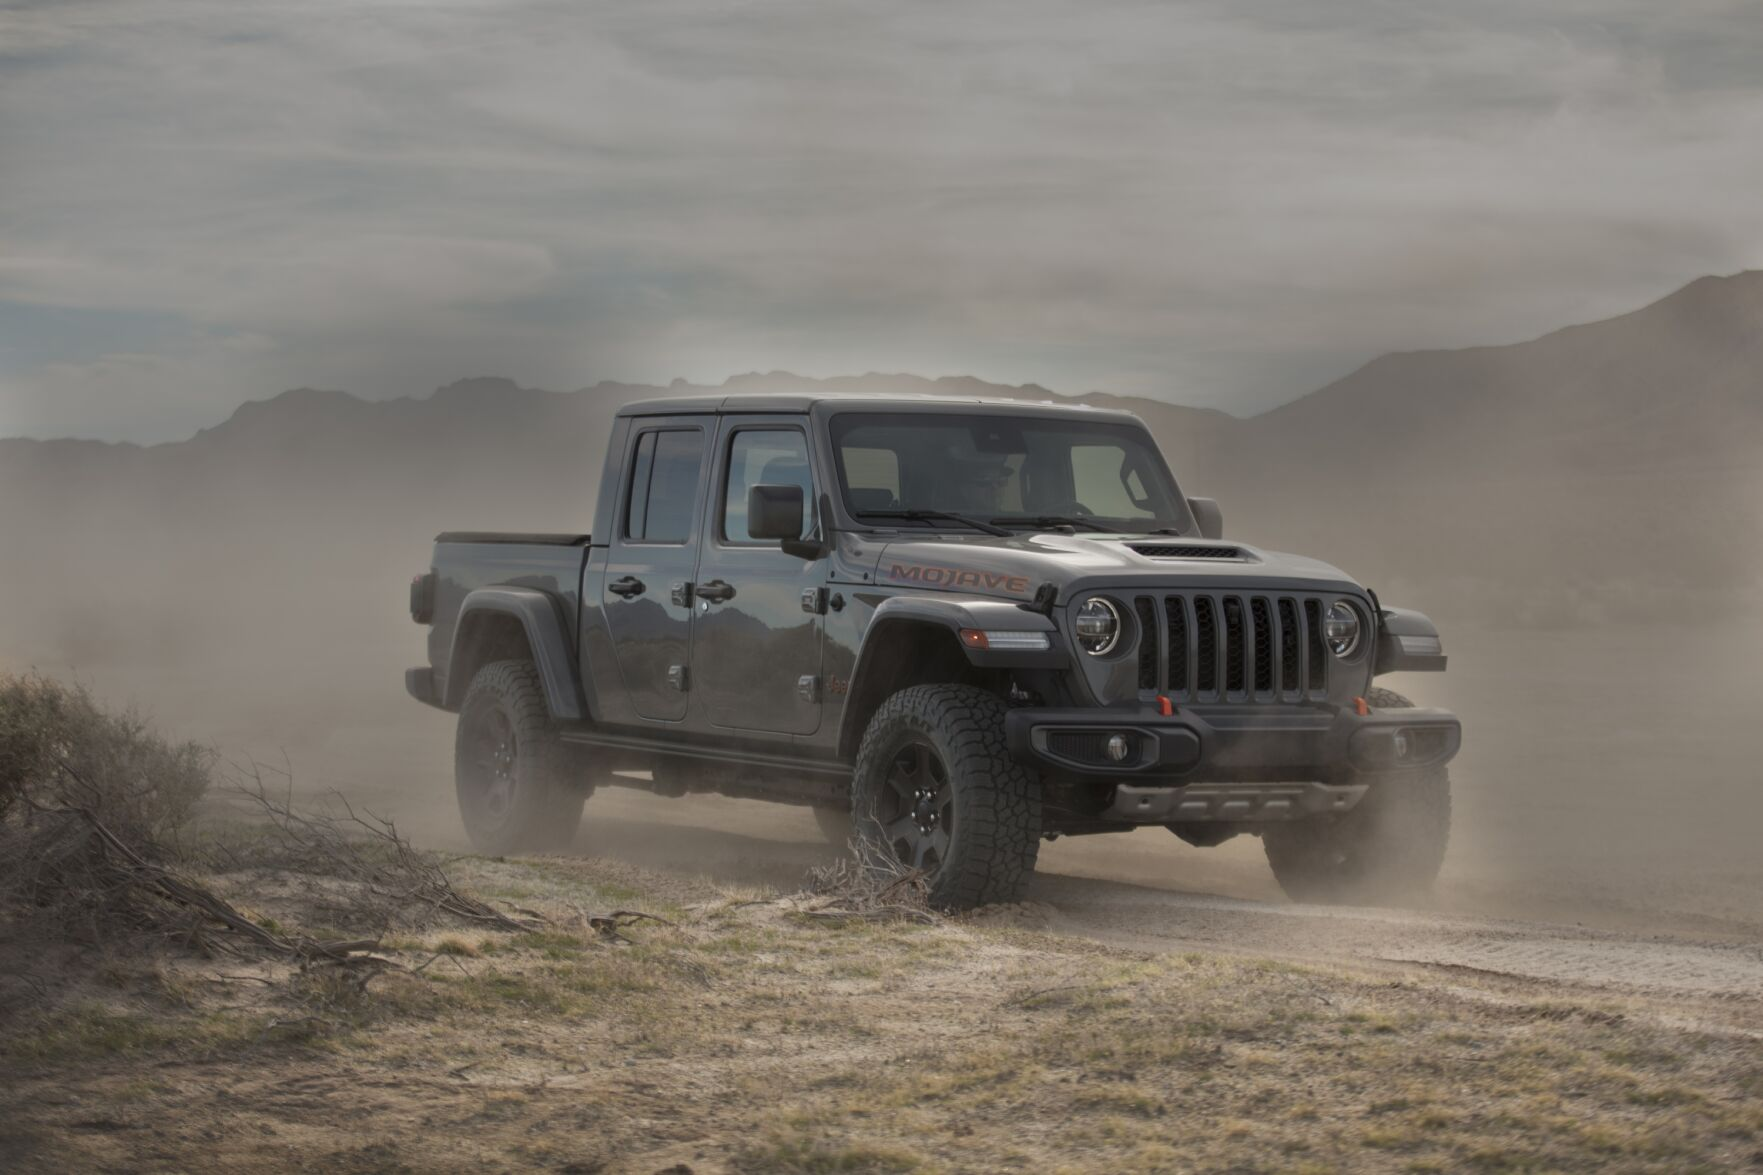 2020 Jeep Gladiator Mojave Brandavestudios Stltoday Com